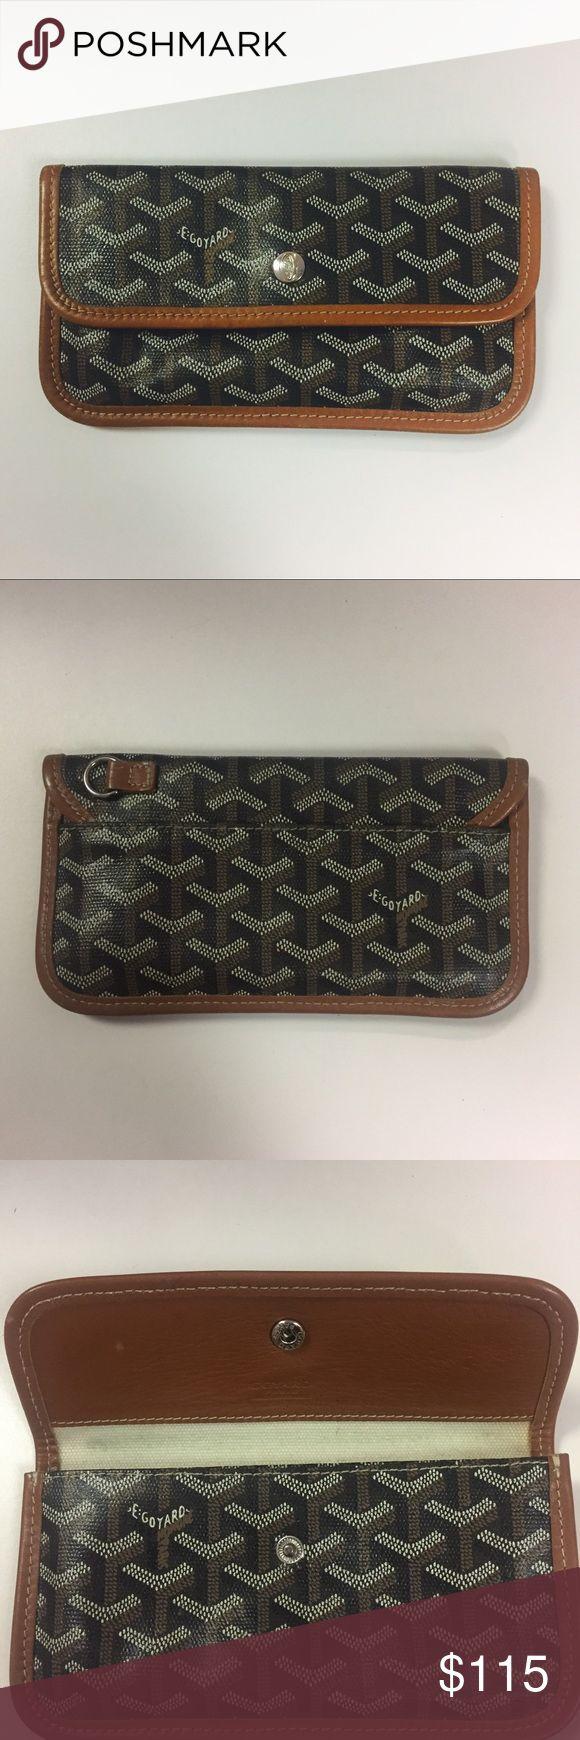 Authentic Goyard pouchette wallet 👌 Great condition👍 submit offers! Goyard Bags Wallets